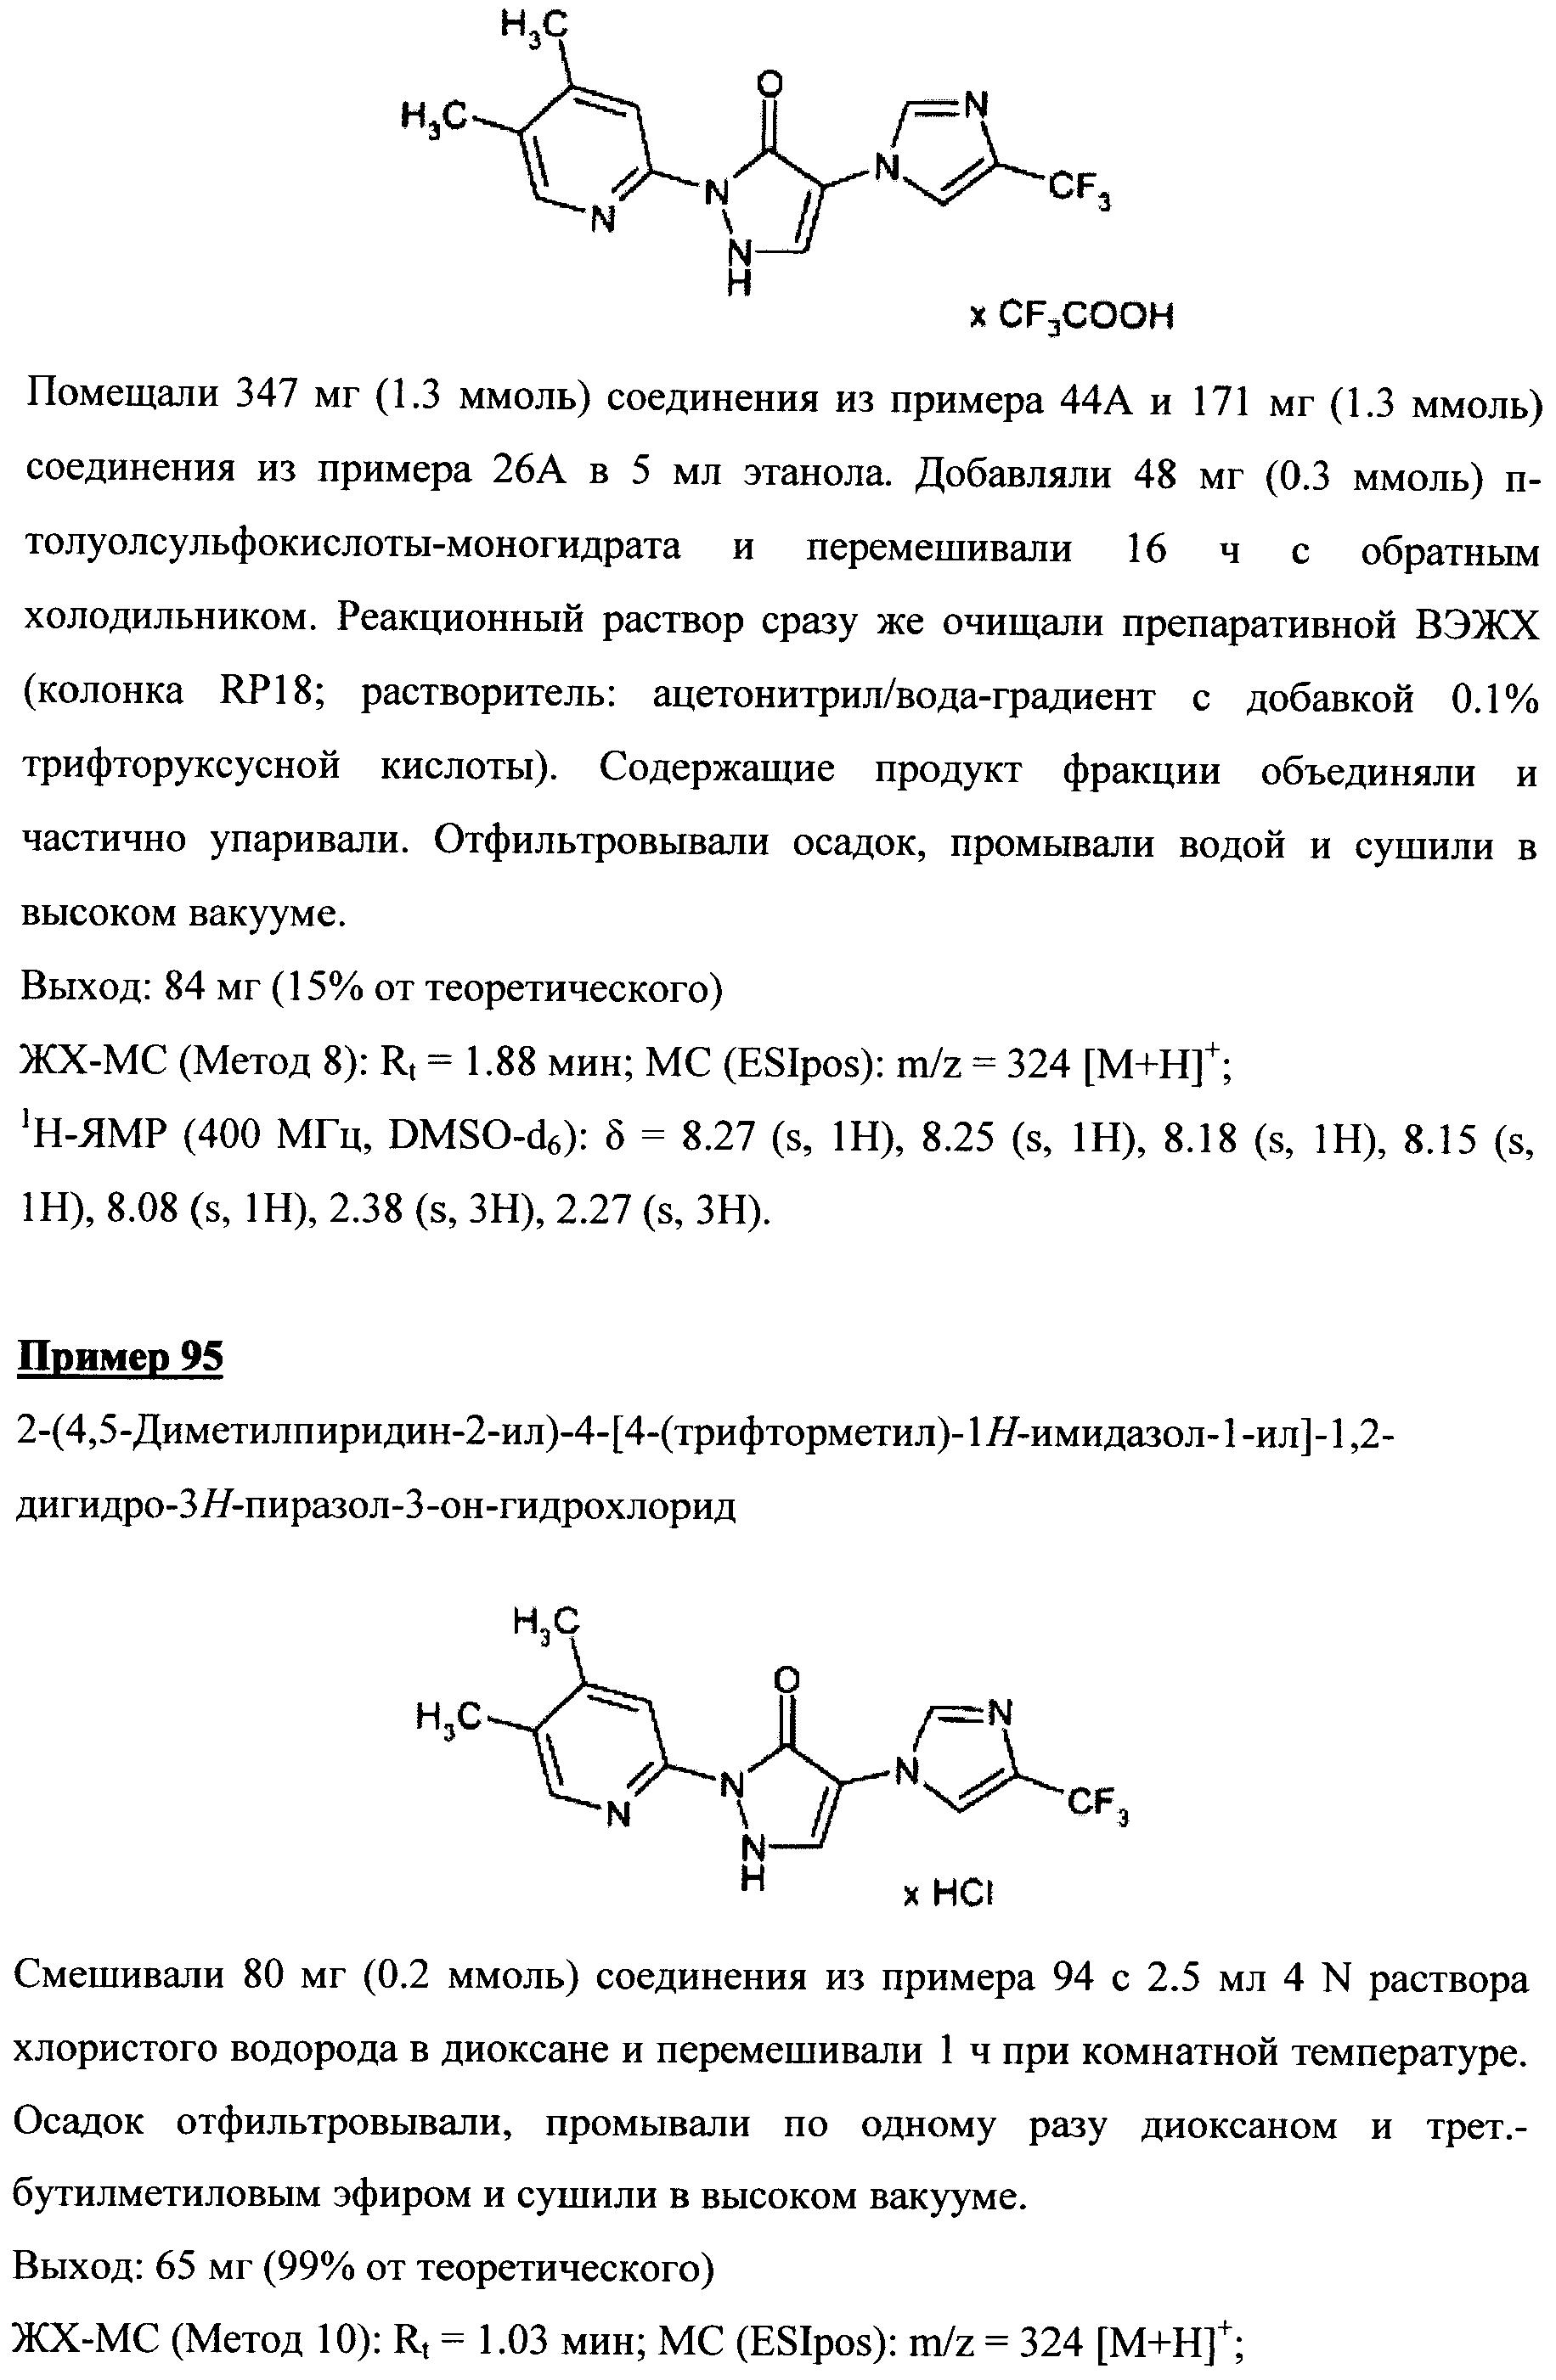 Figure 00000127